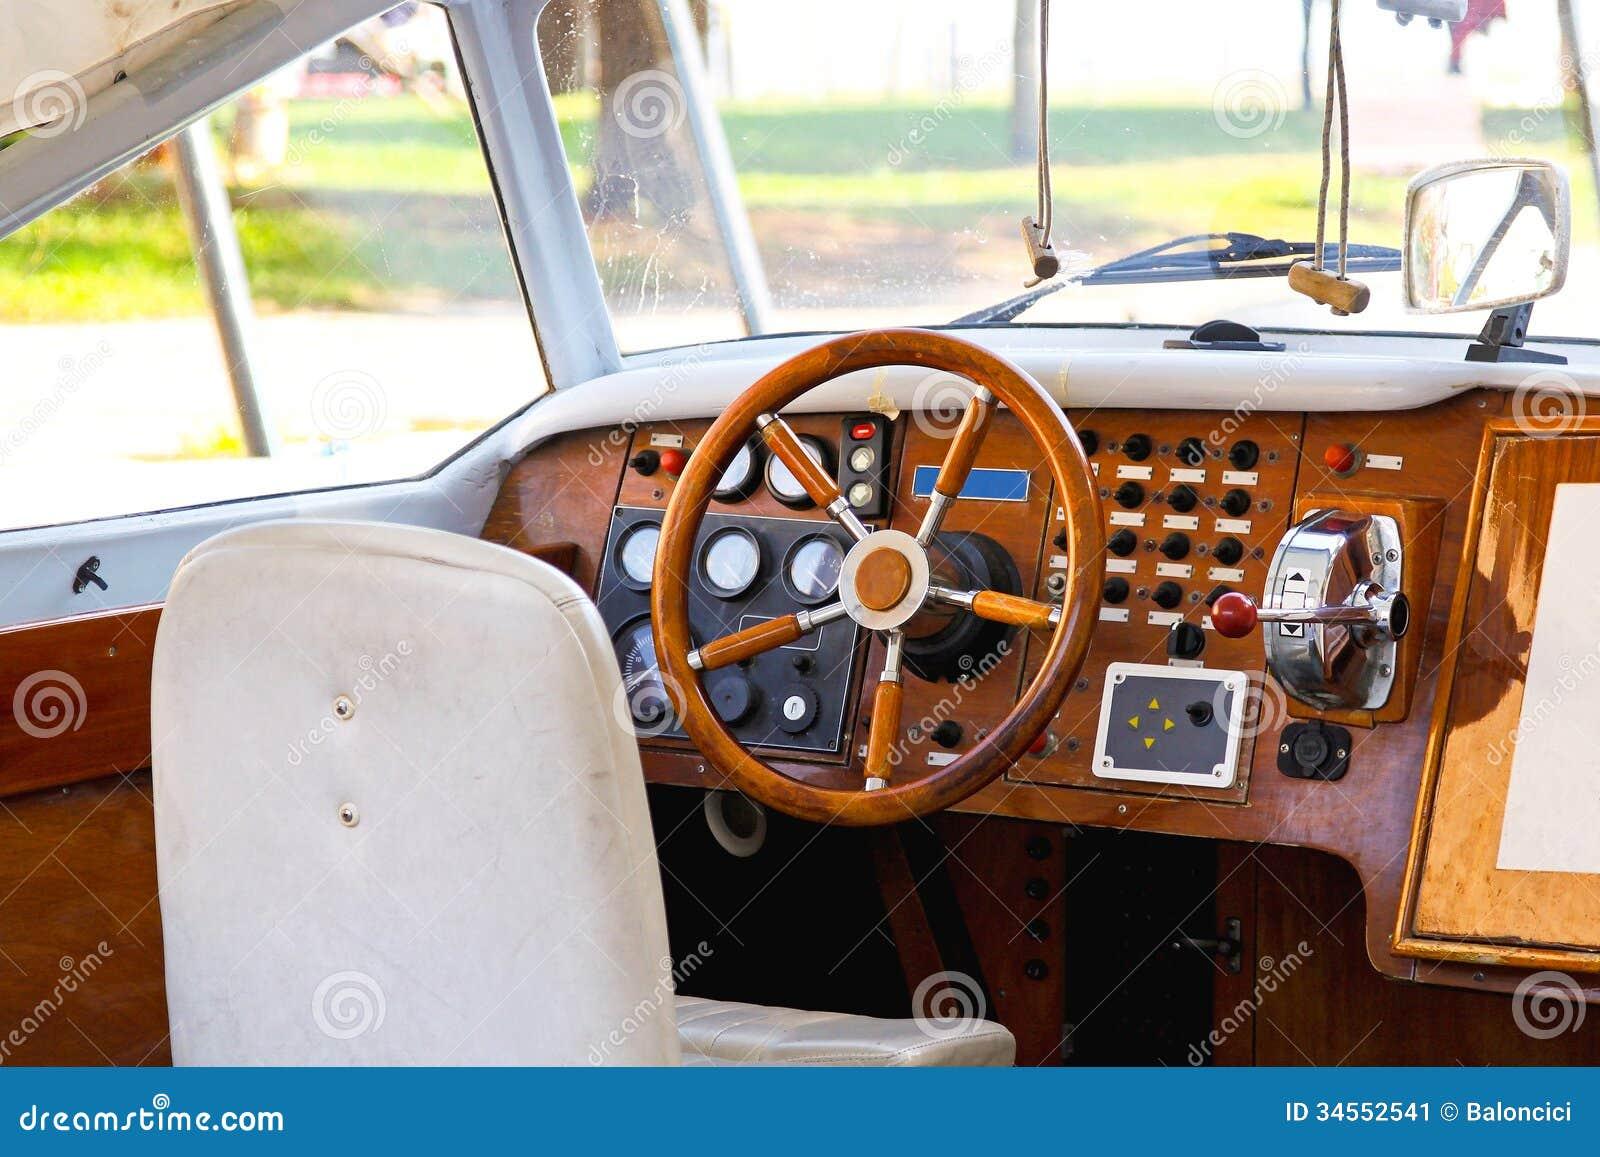 Boat Dashboard Stock Image - Image: 34552541